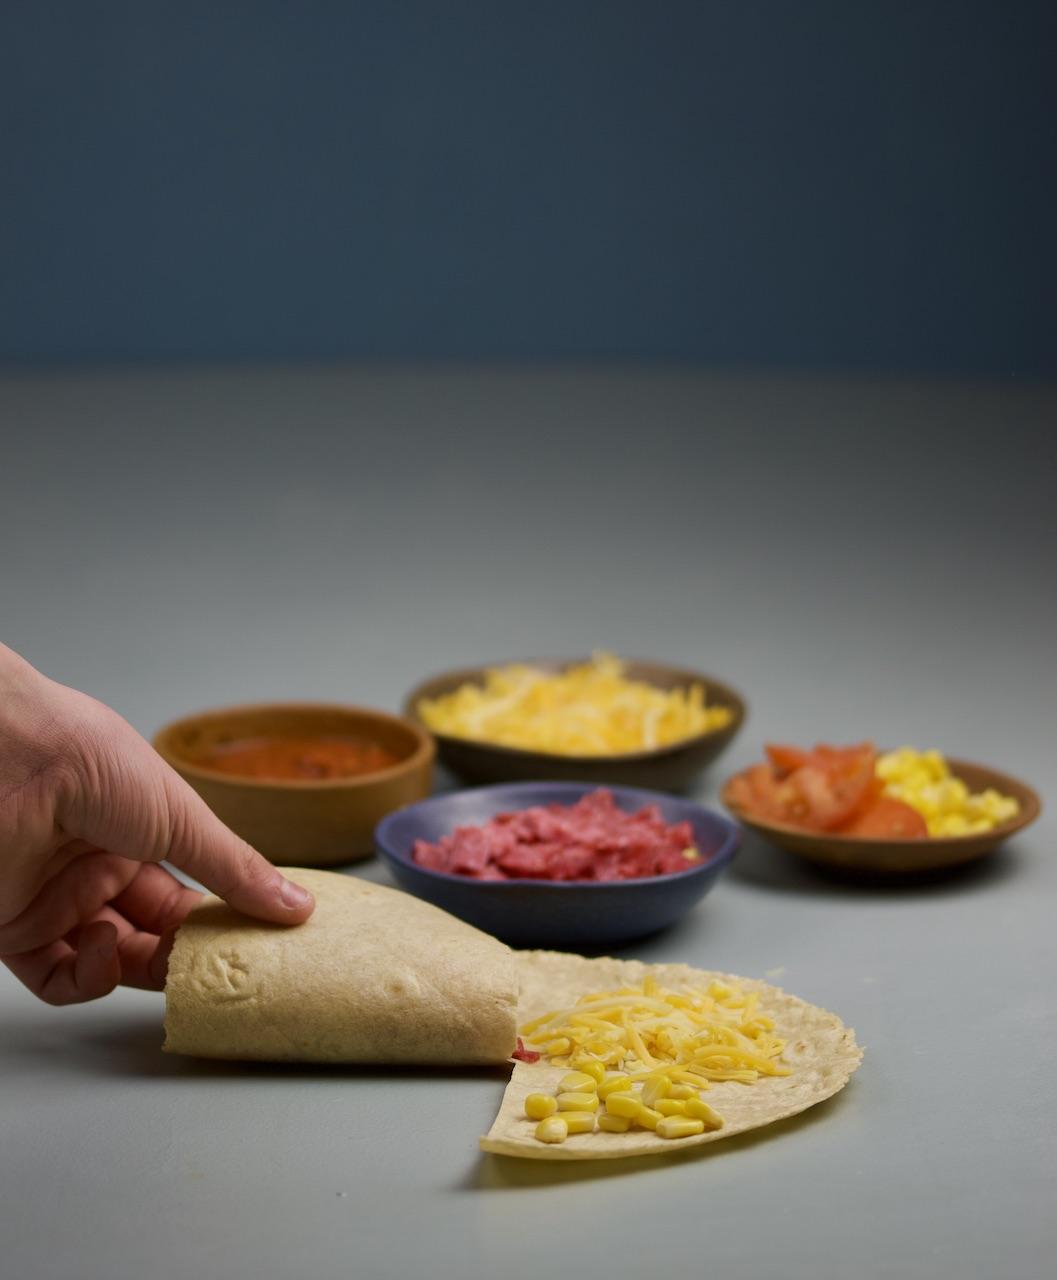 Glutenfri quesadilla med ost og salami